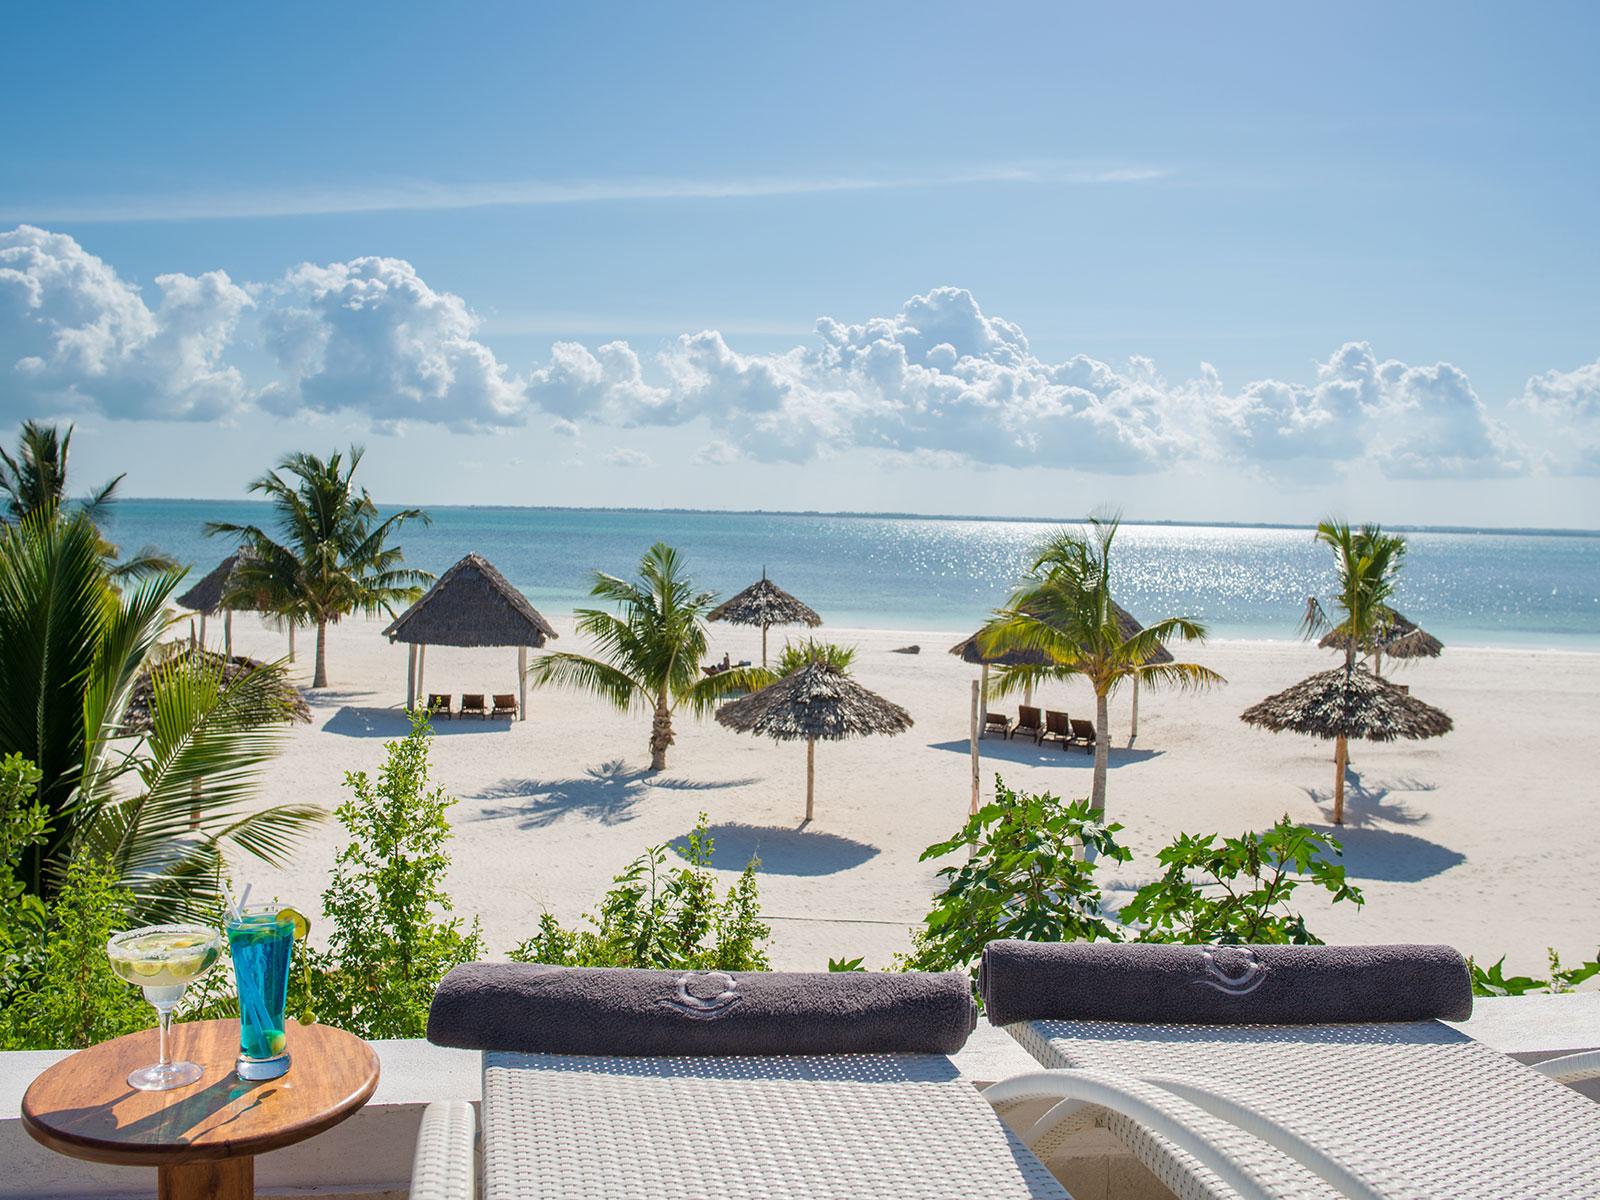 Konokono Beach Resort and Spa